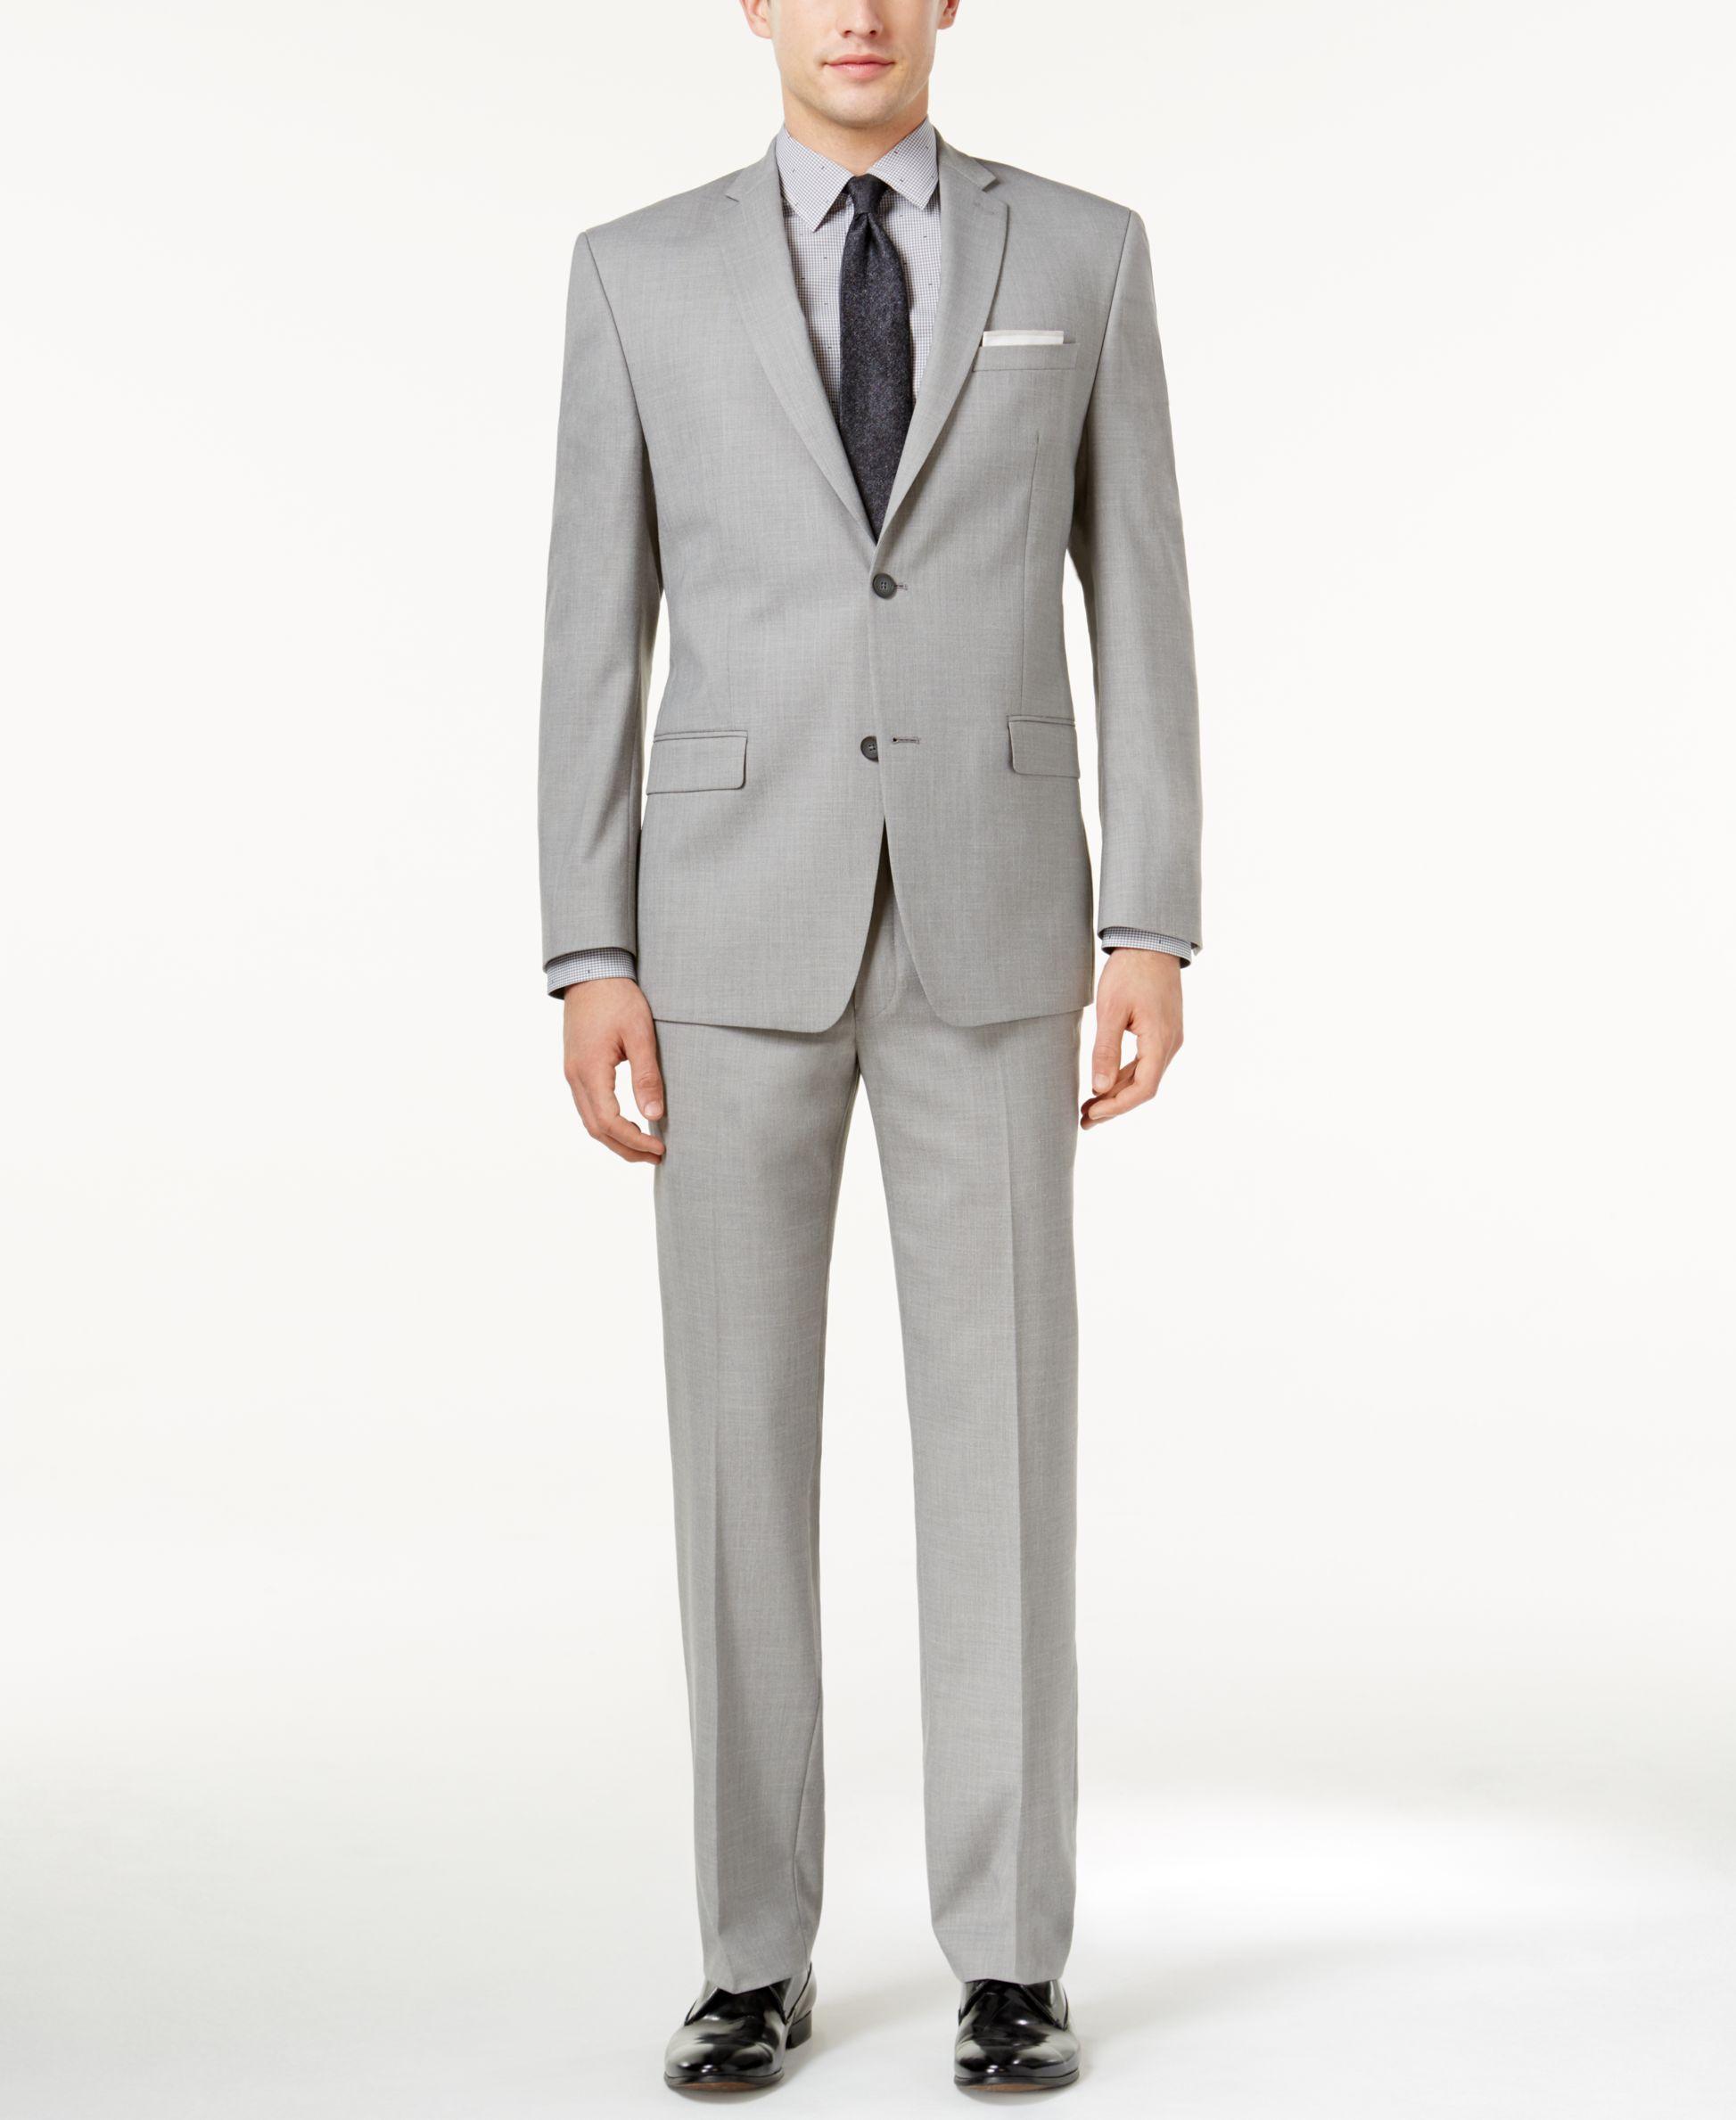 men slimfit light p fit gray pants suit modern clothing mens slim separate madison s